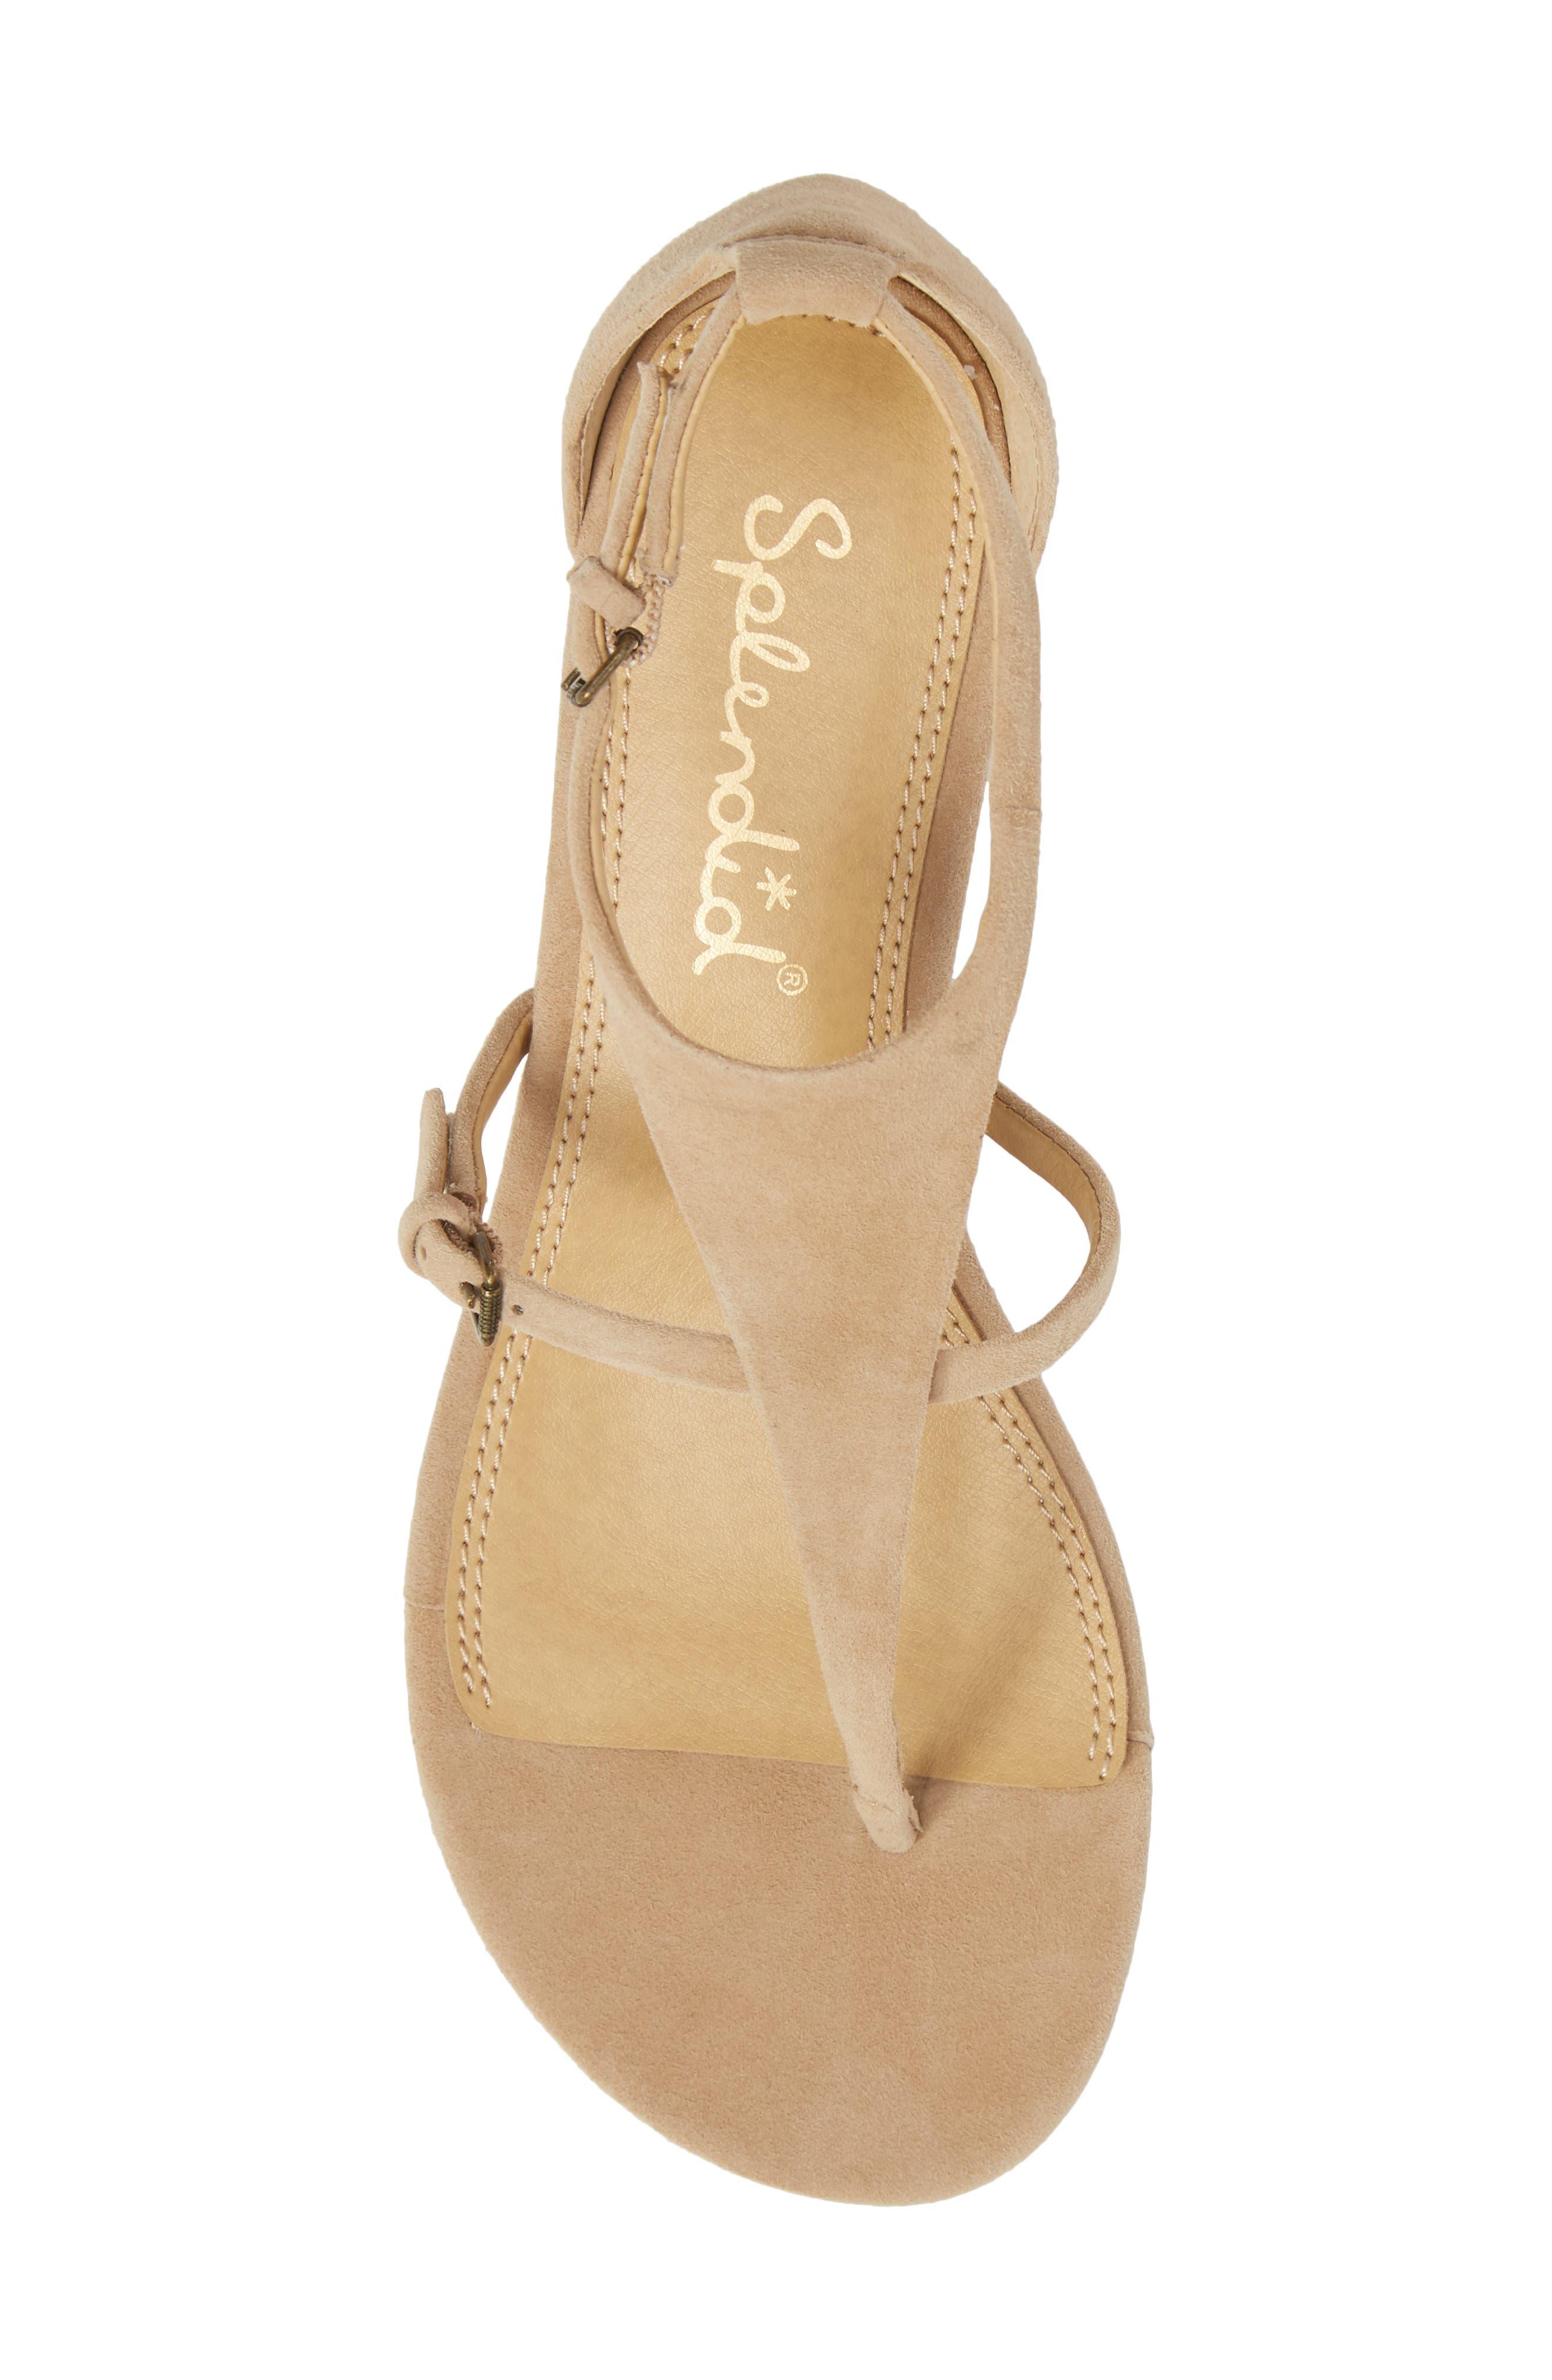 Brooklyn V-Strap Wedge Sandal,                             Alternate thumbnail 18, color,